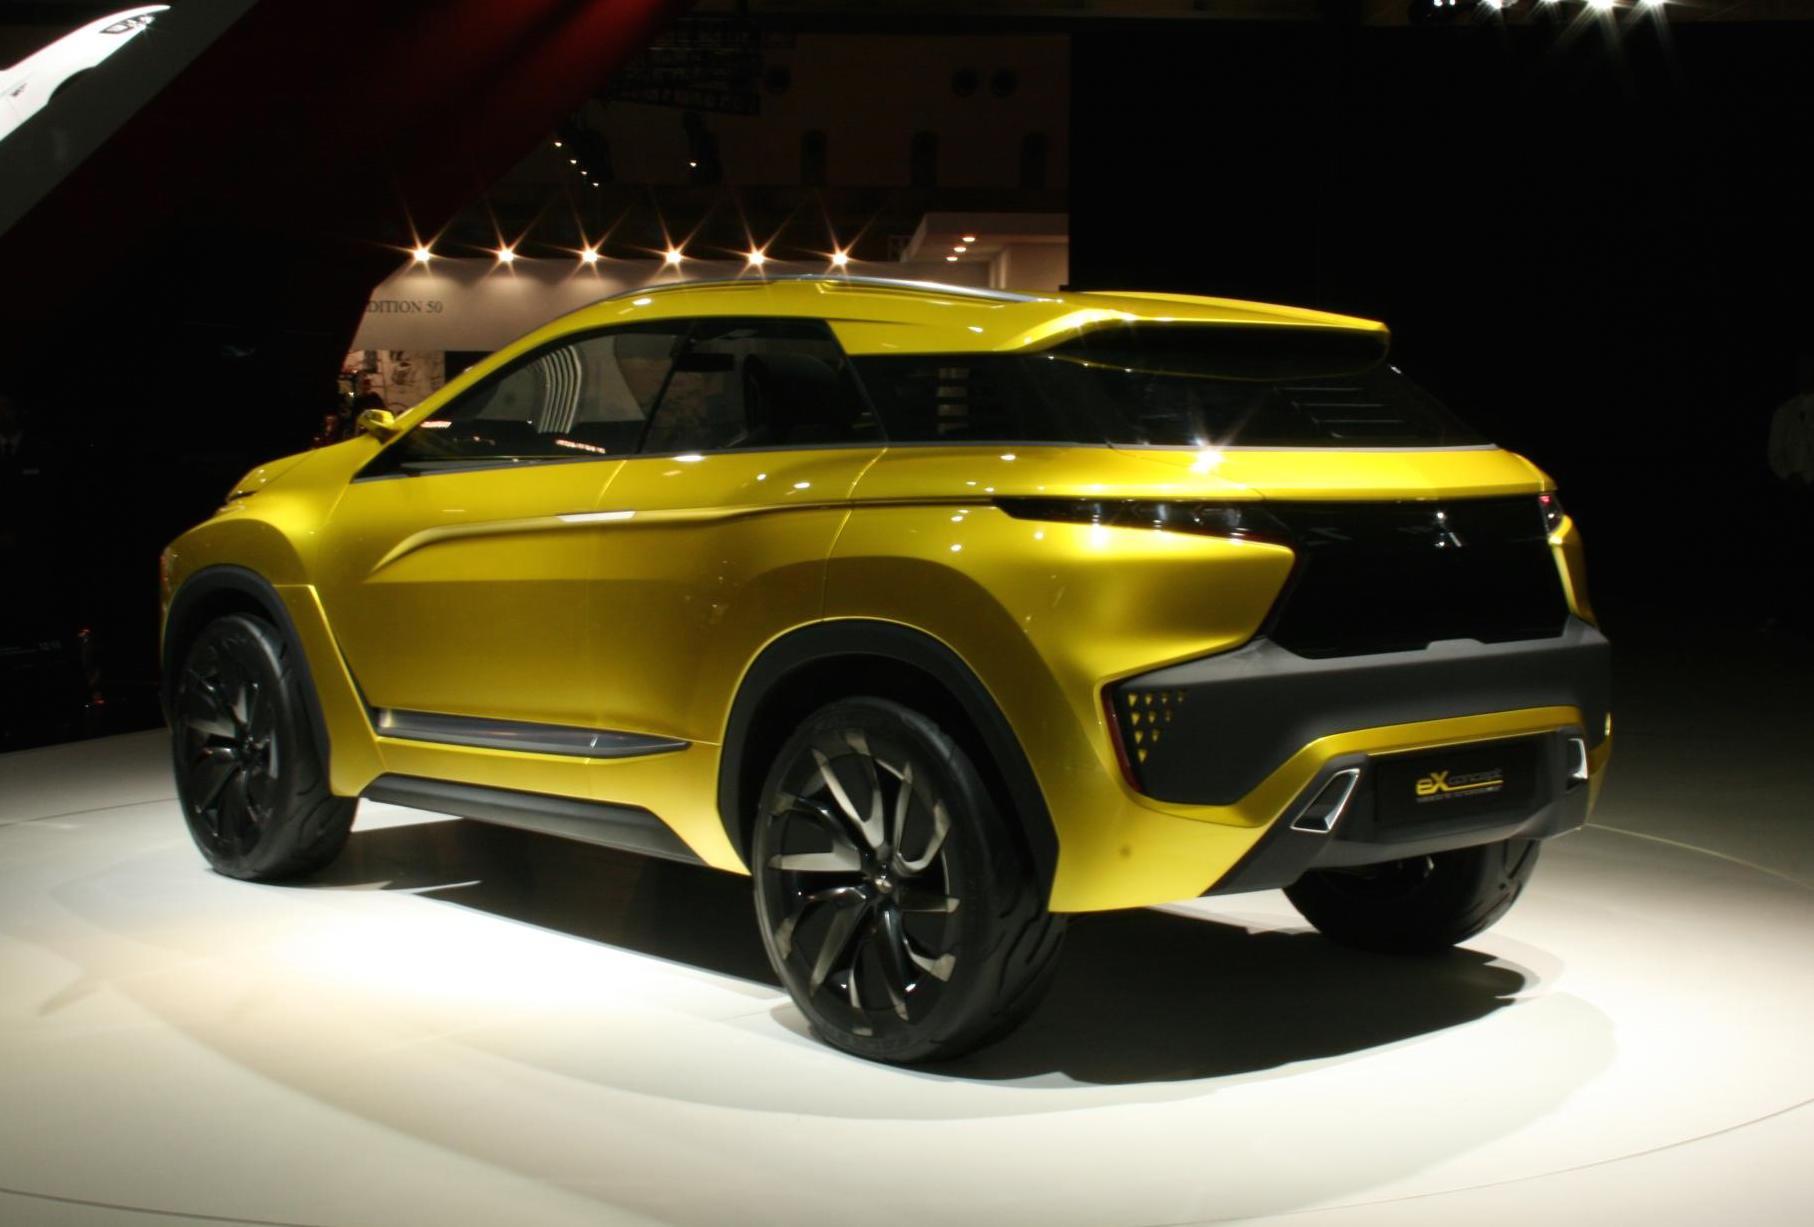 Mitsubishi Ex Concept Previews New Suv To Slot Between Asx